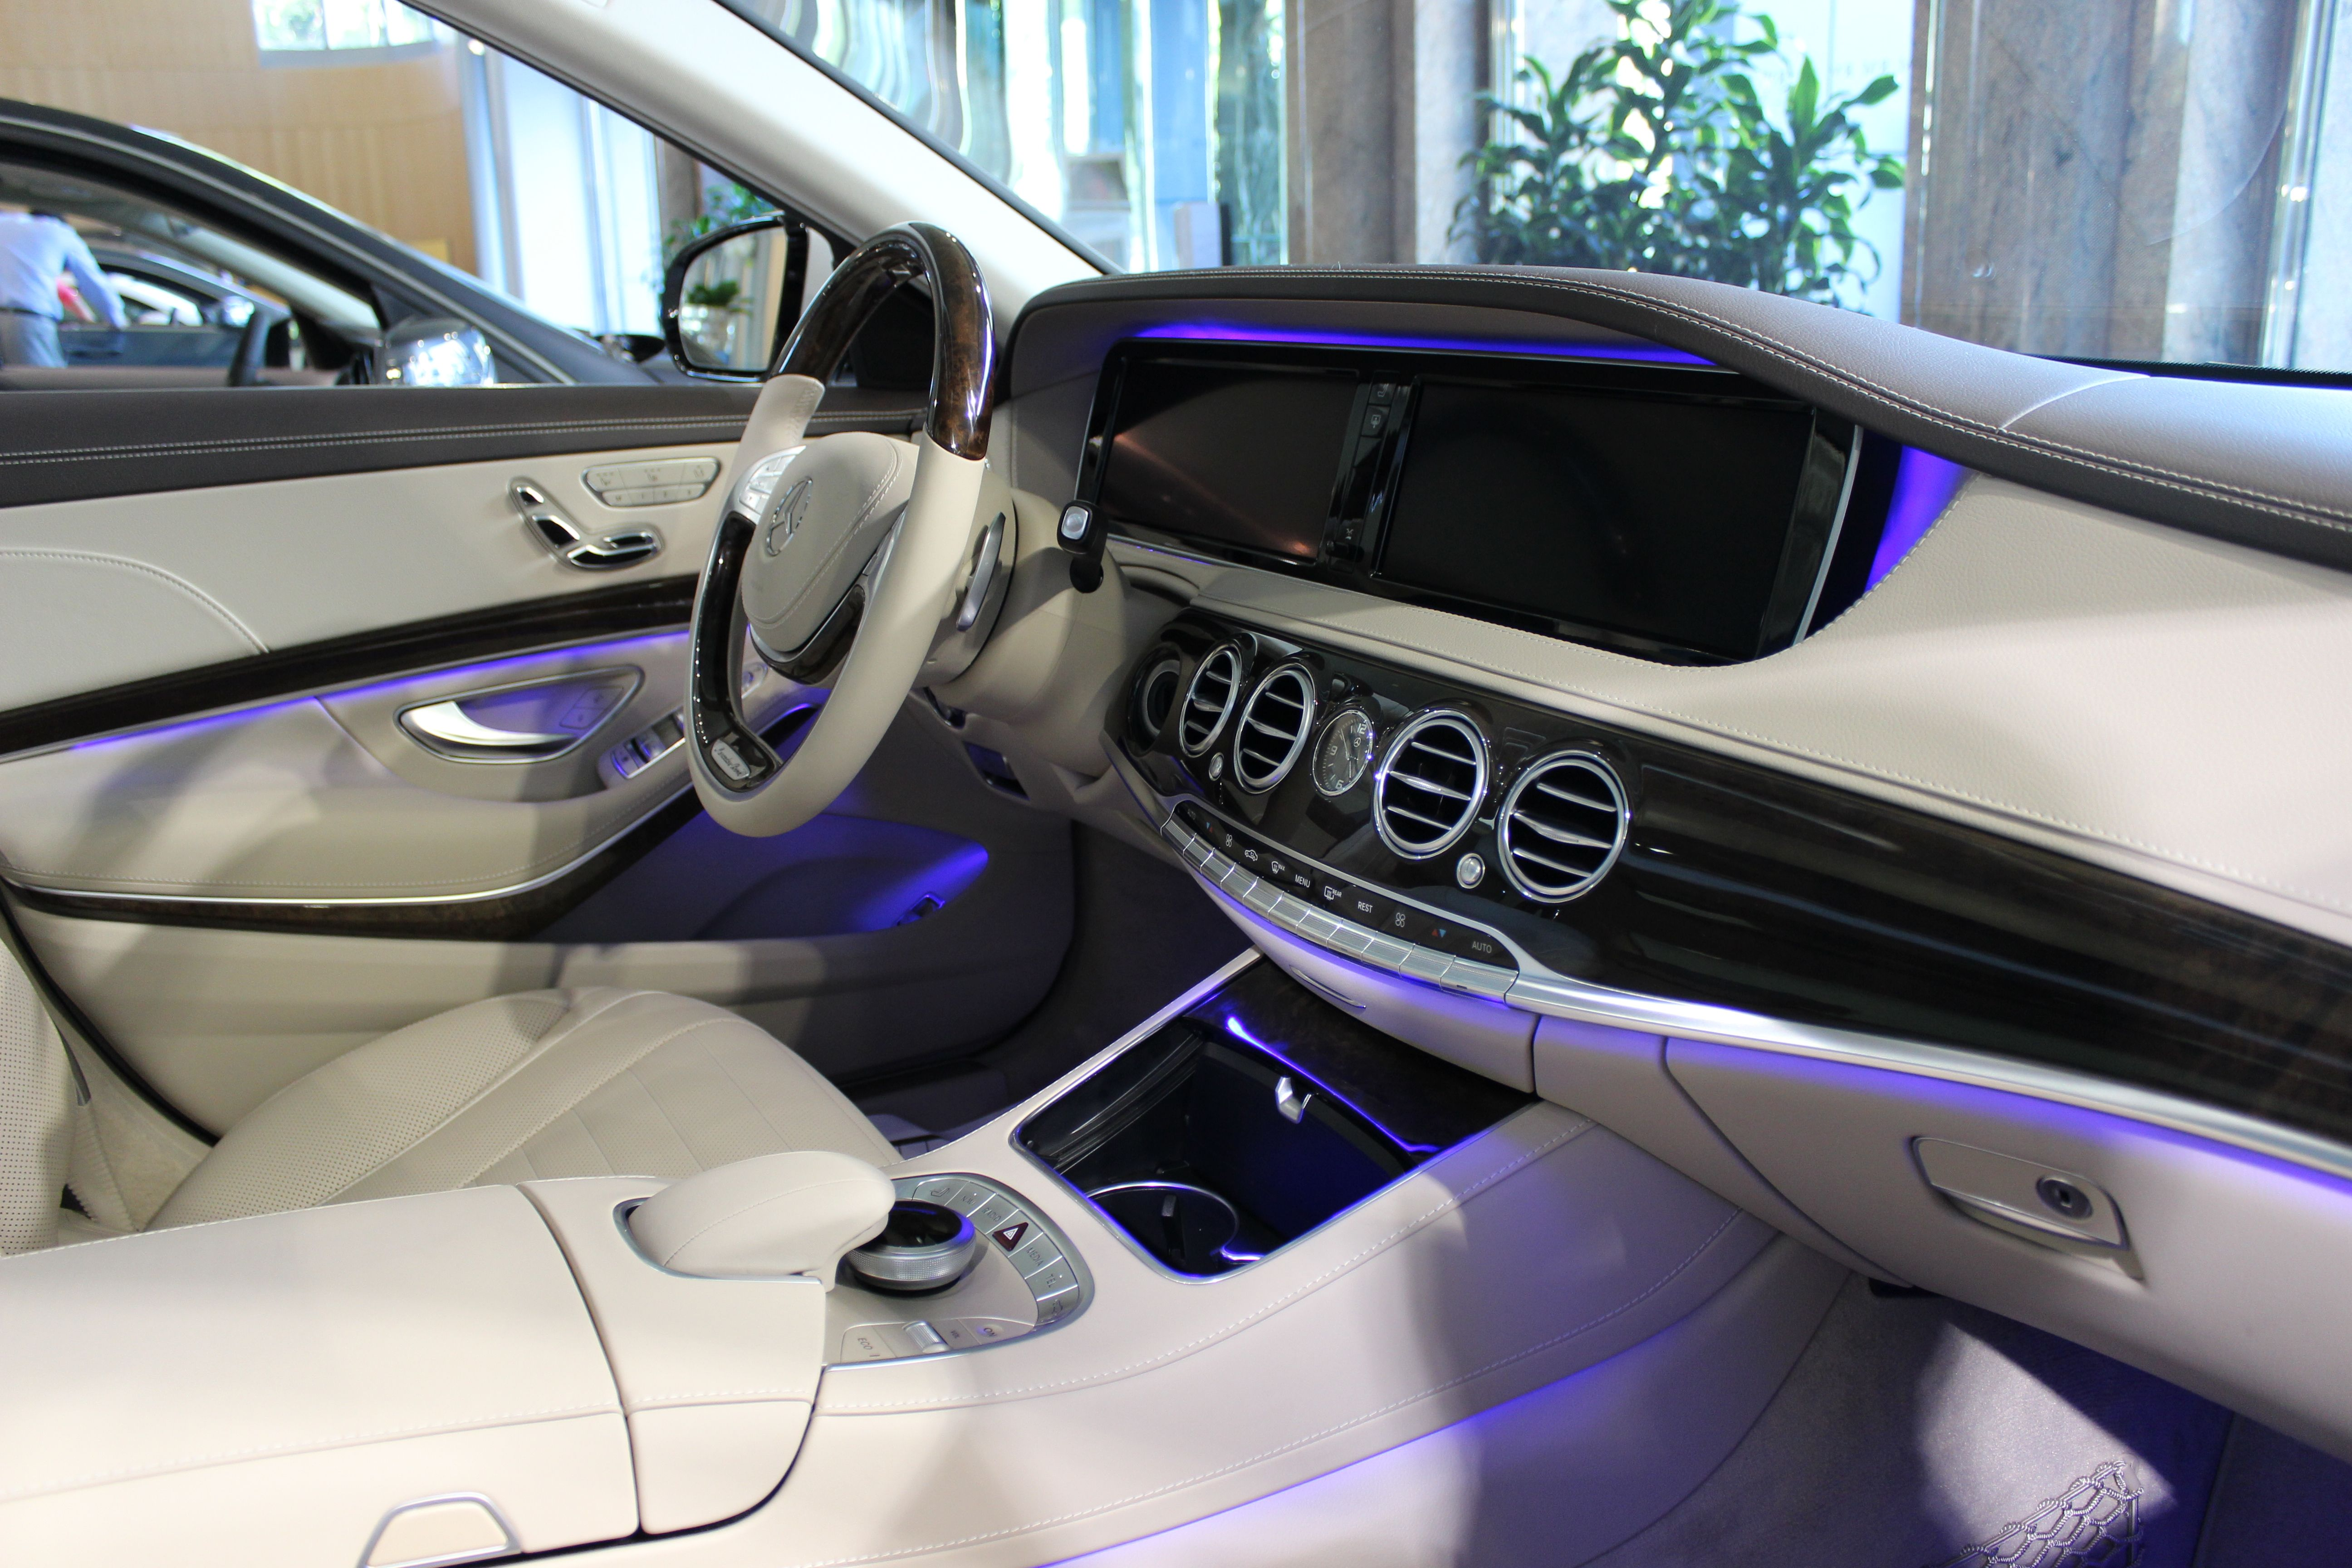 2014 mercedes benz s class interior - Mercedes Benz 2014 S Class Interior